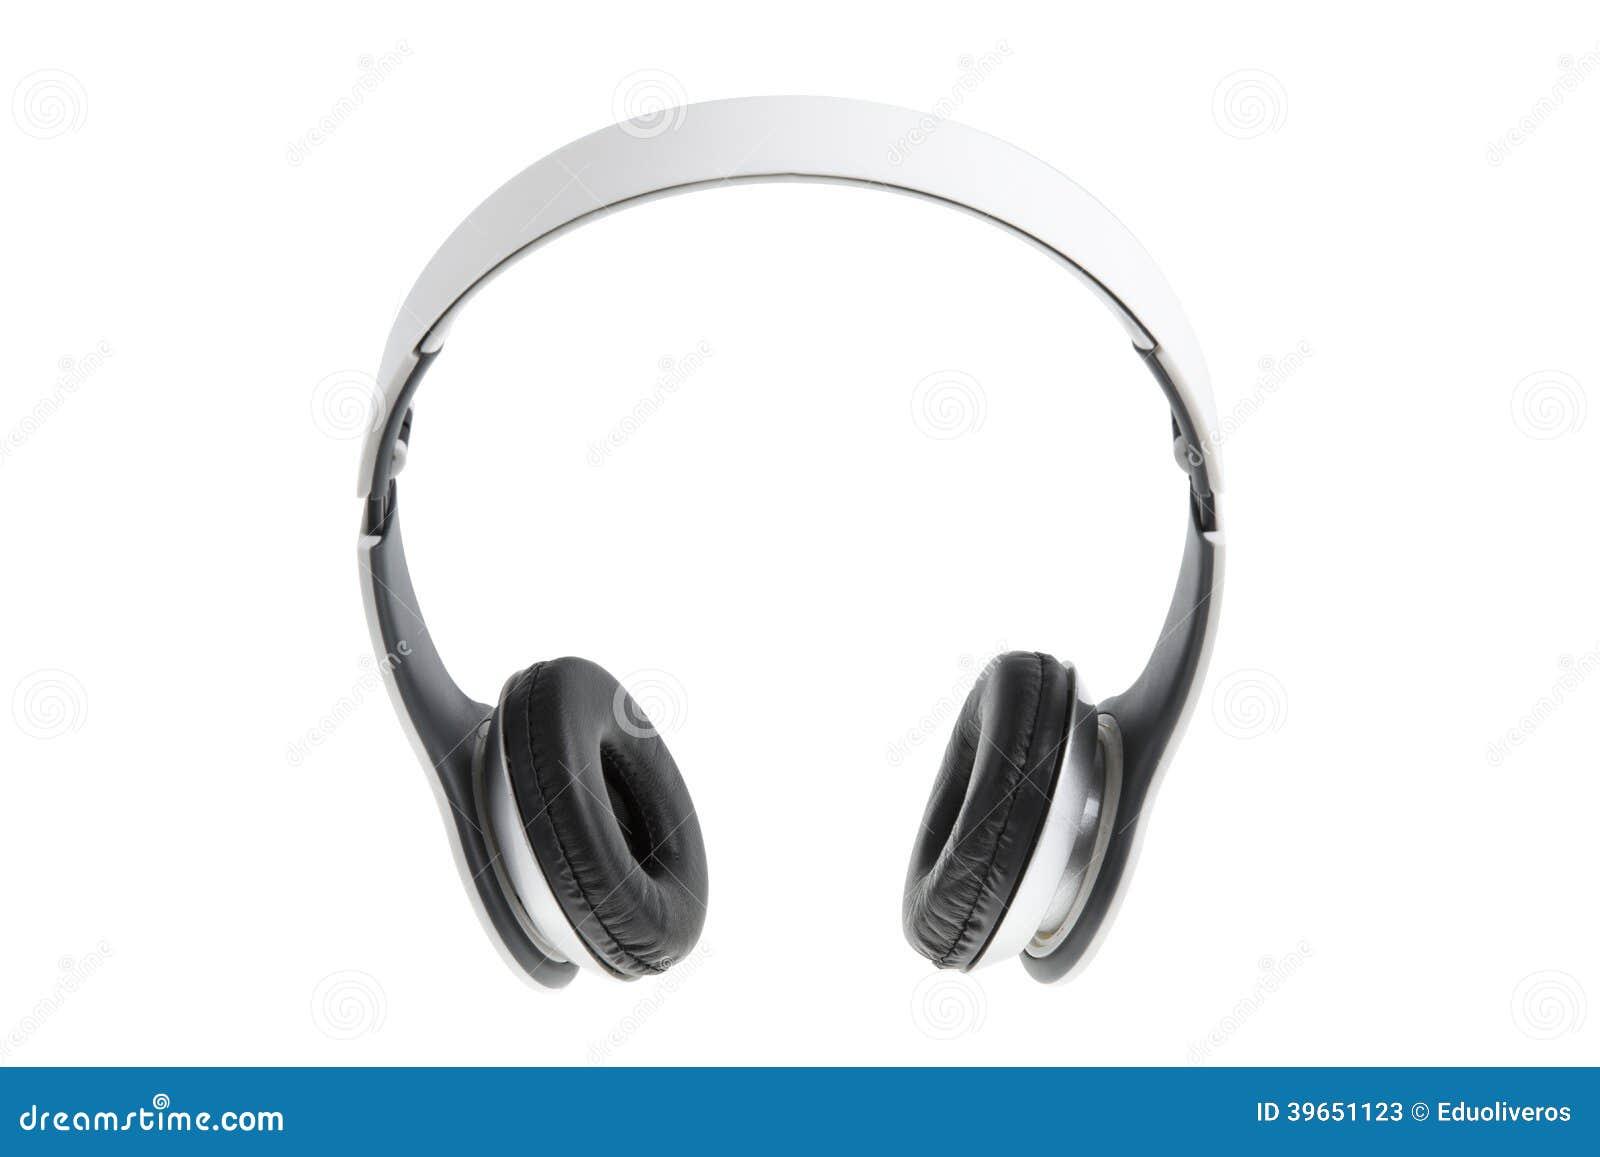 how to fix earphone padding